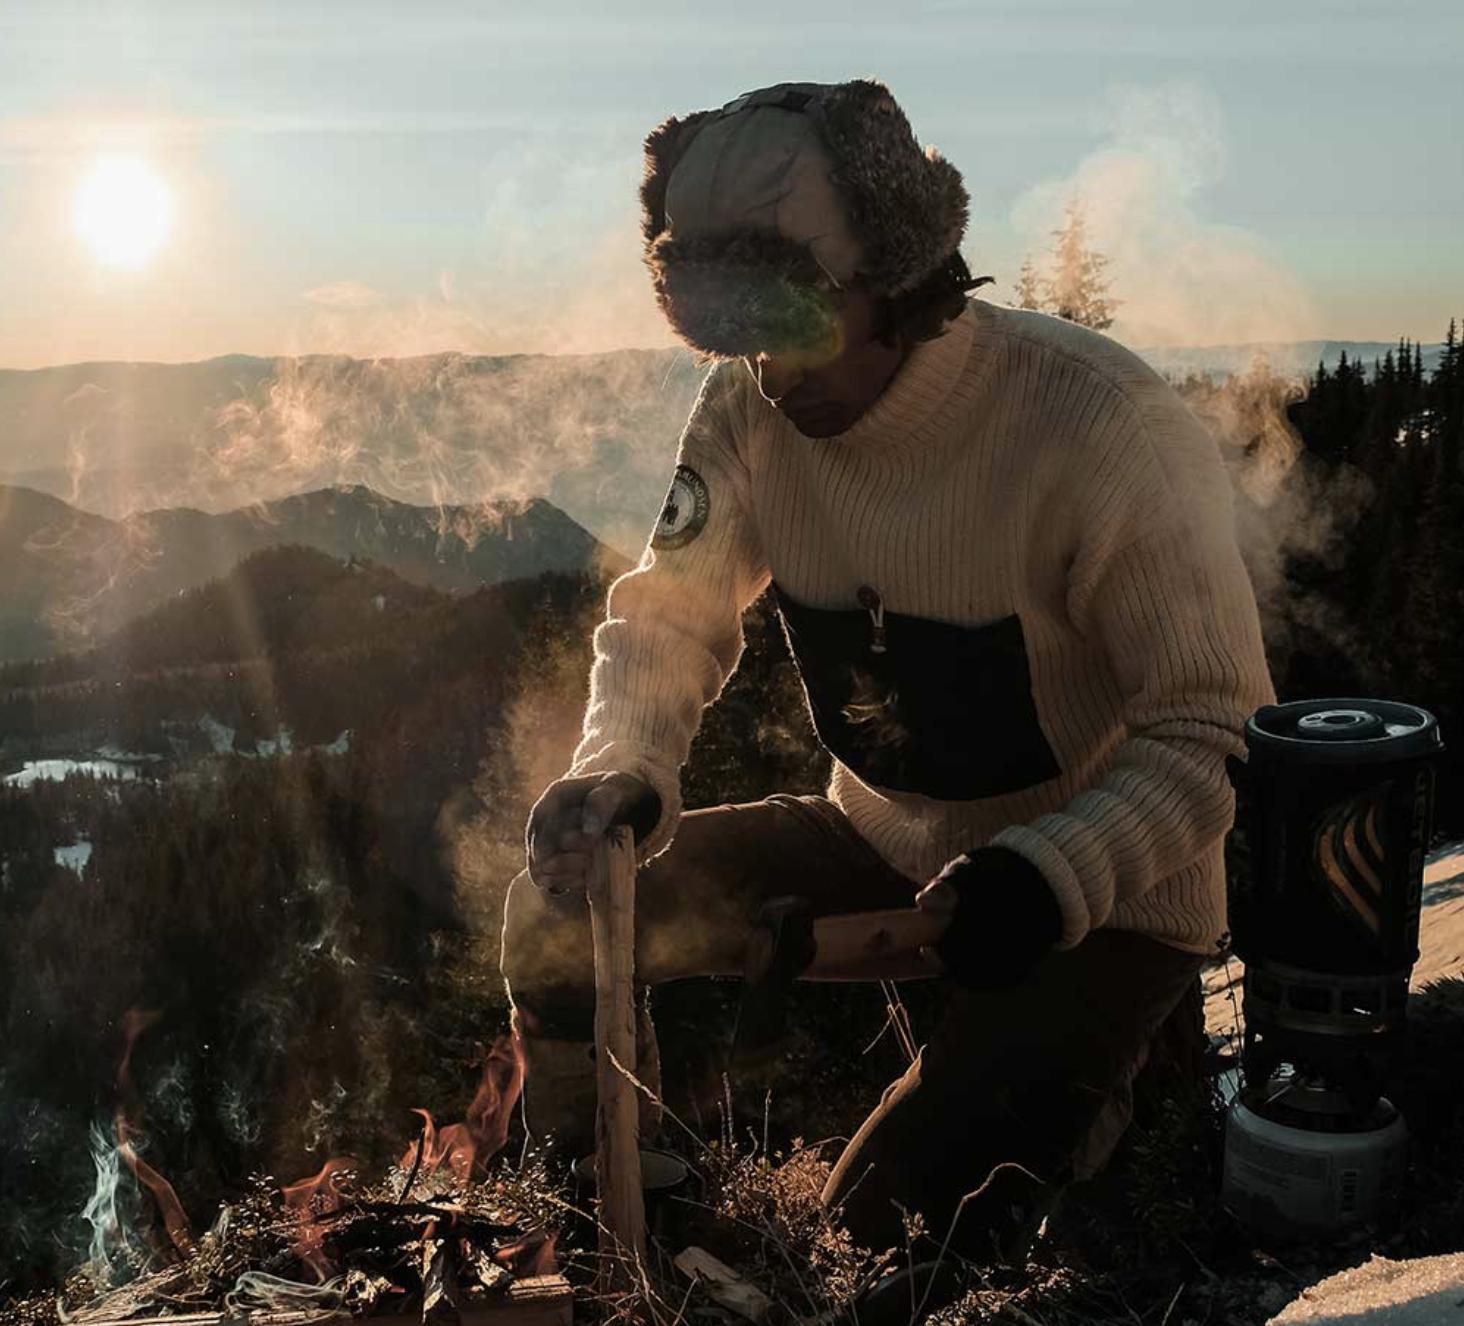 Bilde av Amundsen Heroes turtle neck mens MSW06.1.610